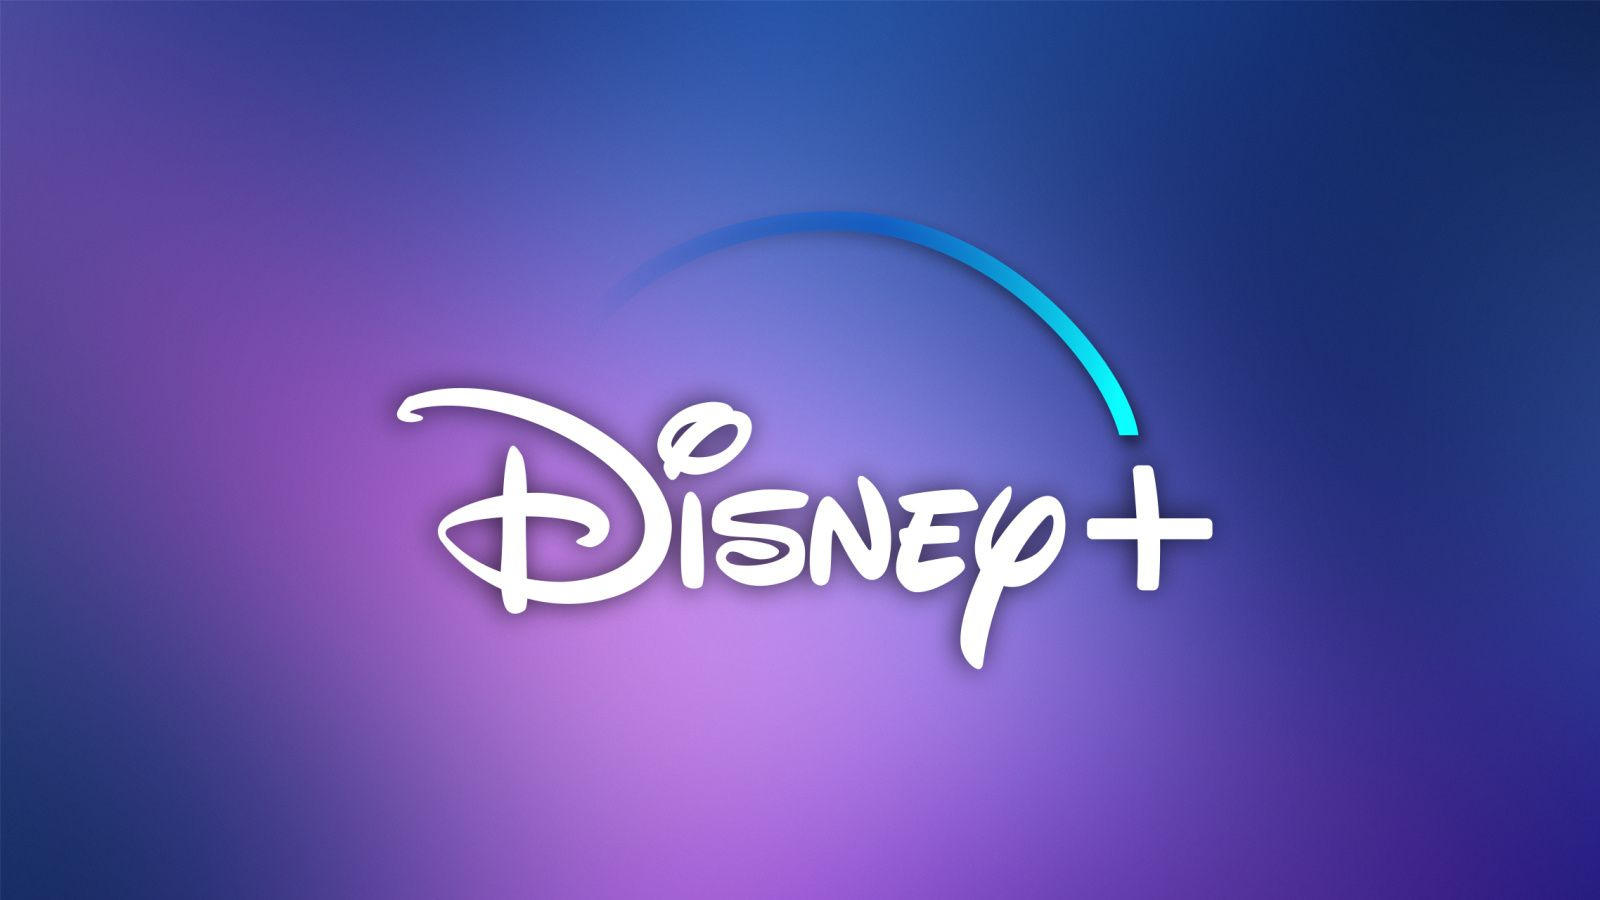 Disney+ South Africa